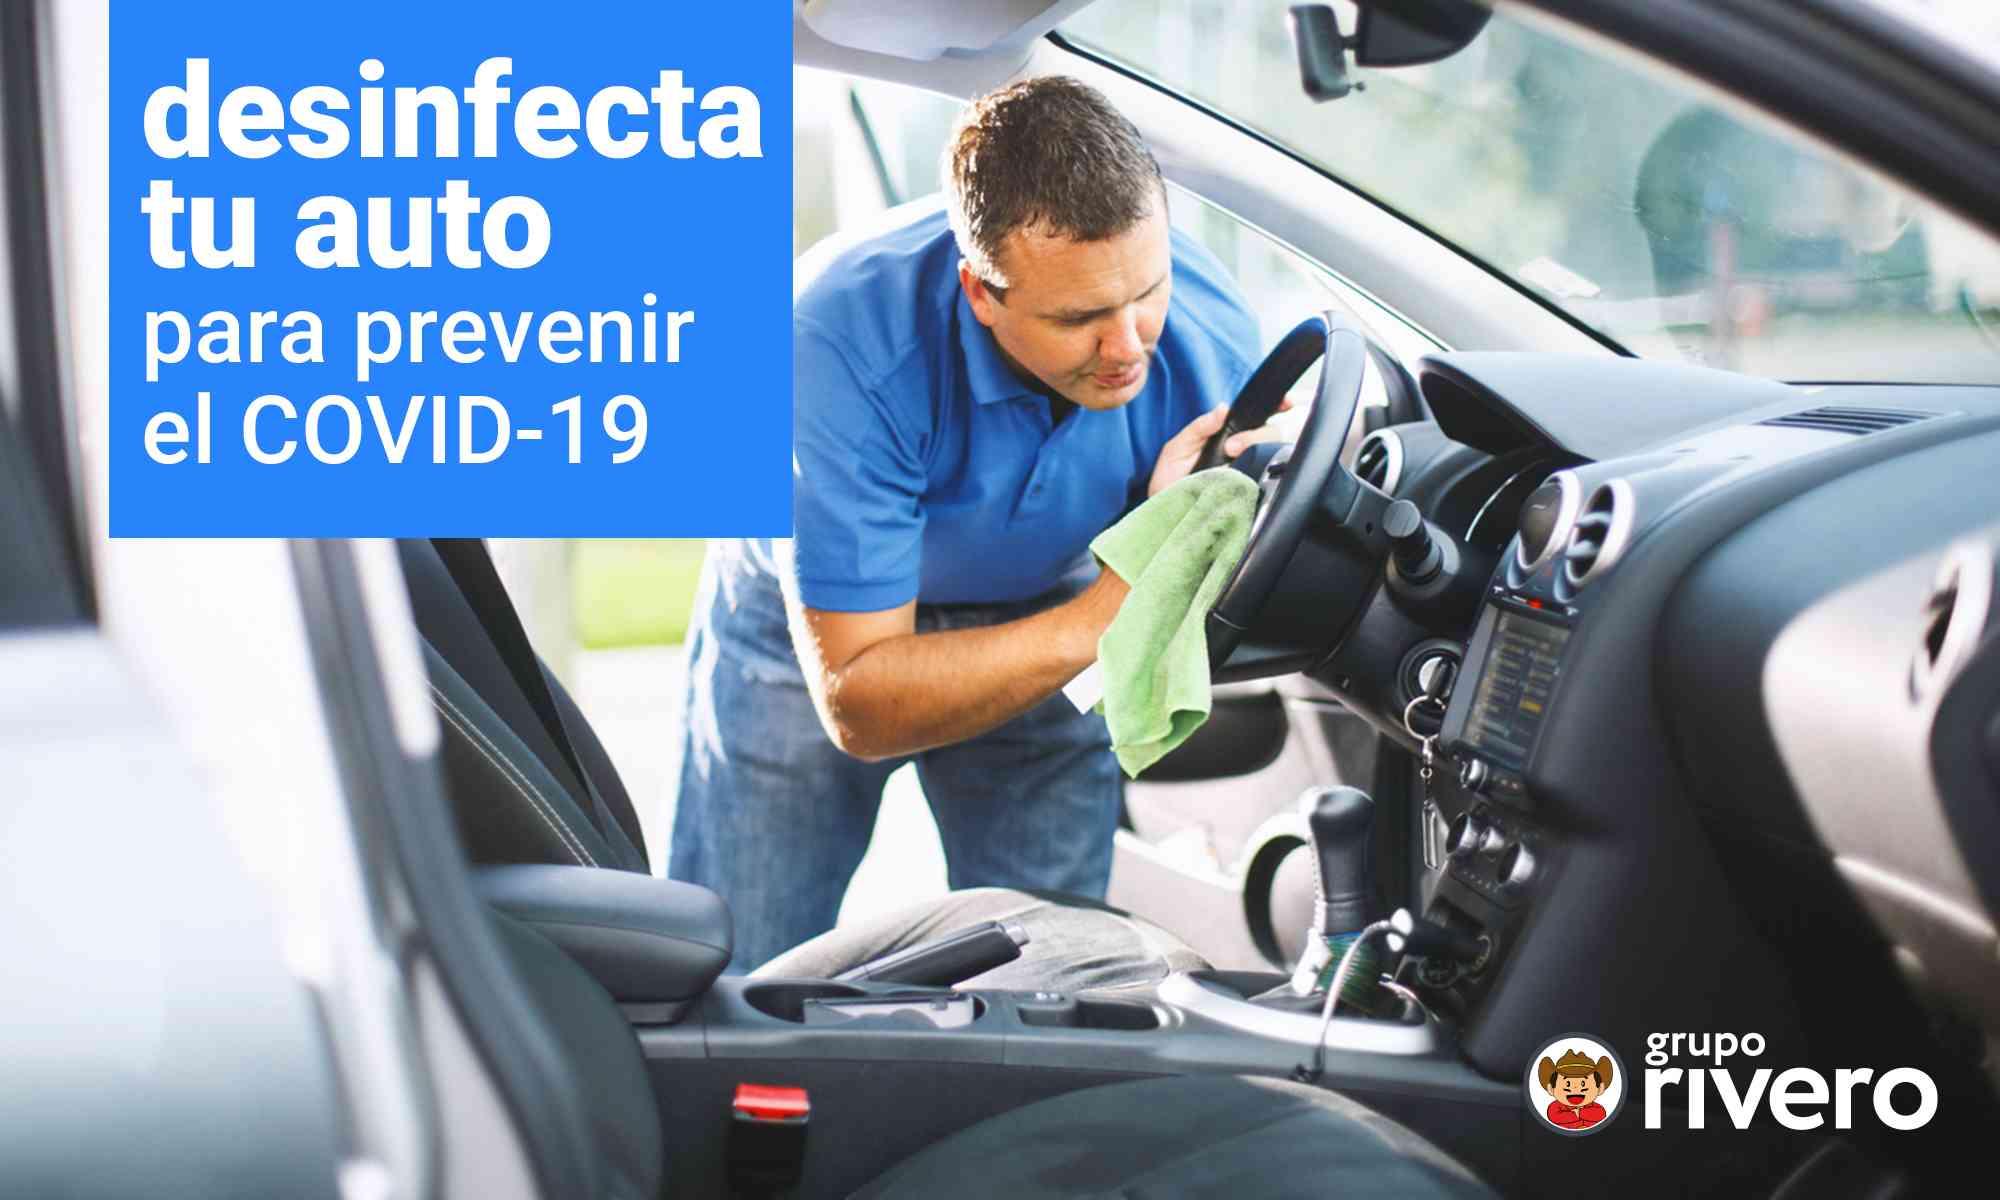 COVID-19, coronavirus, DESINFECTA, DESINFECTA tu auto, DESINFECTA tu carro